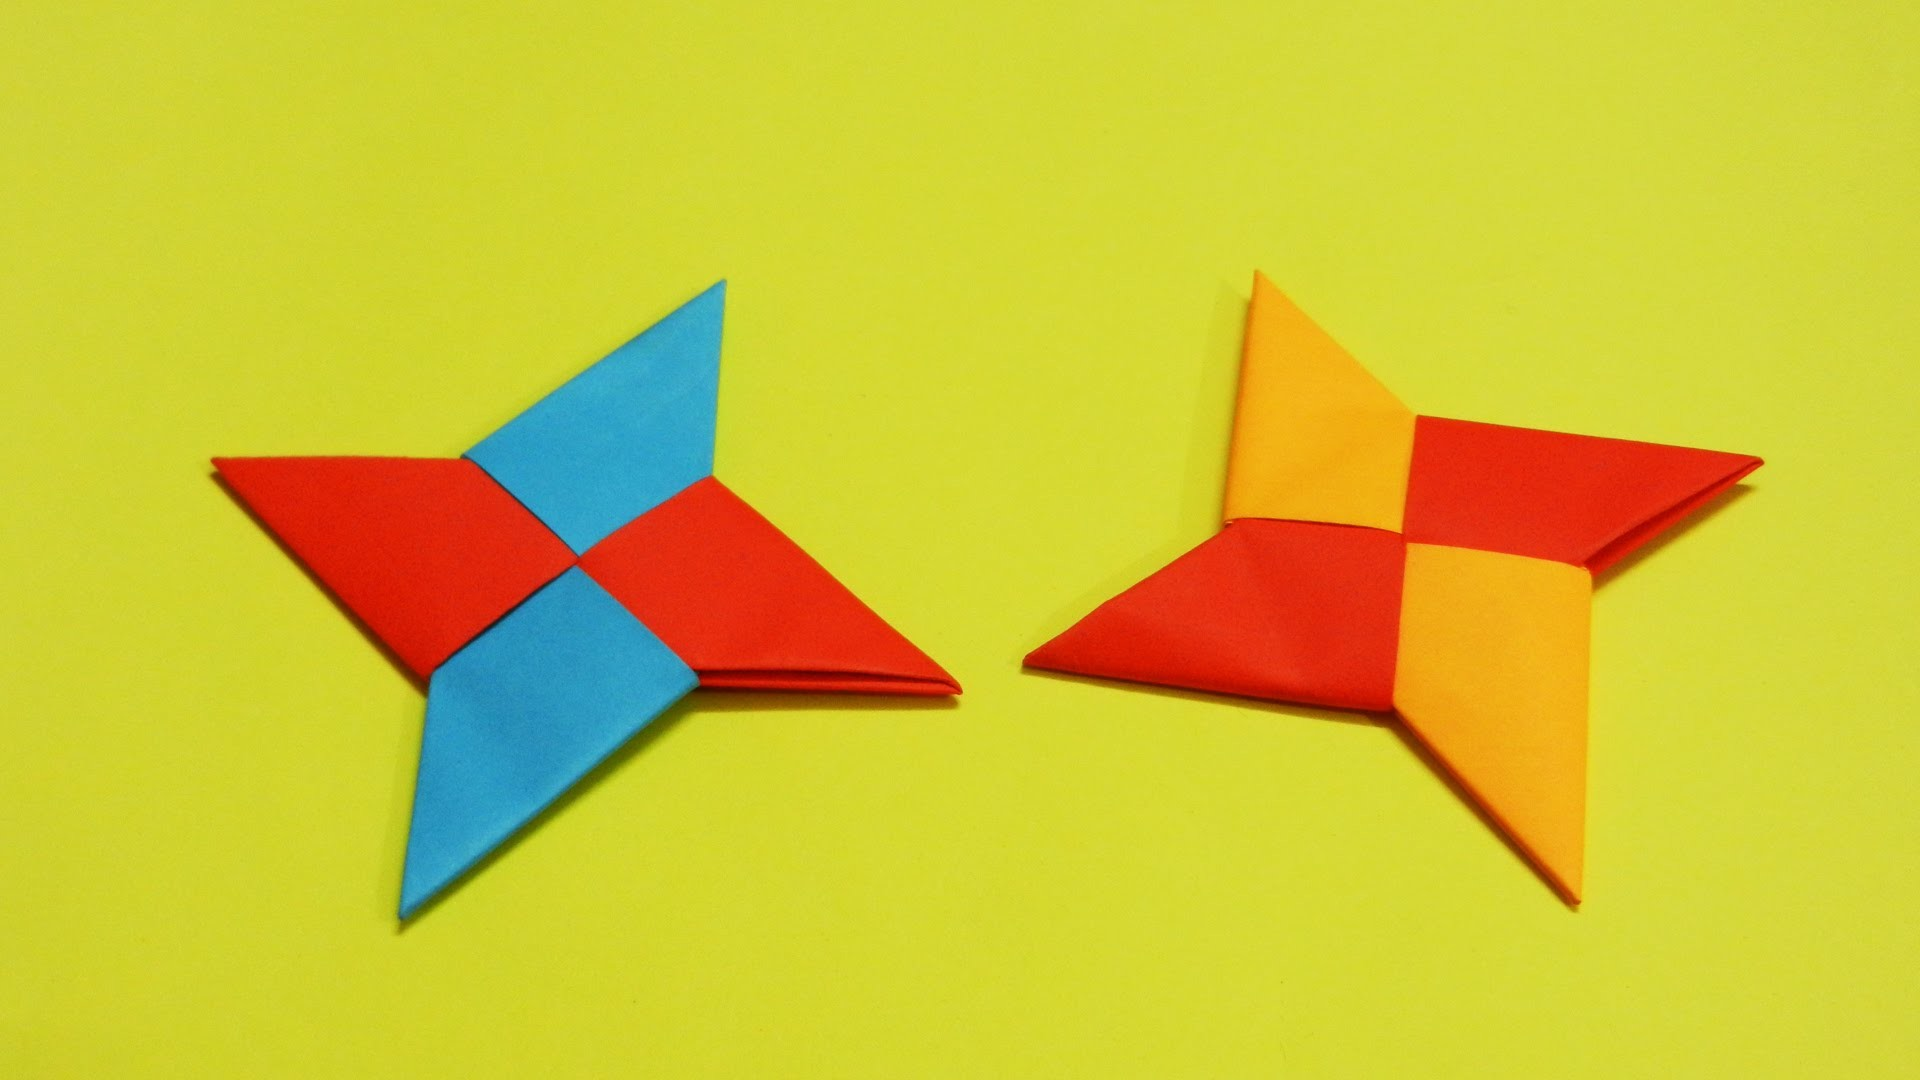 How to make a Paper Ninja Star | Origami Ninja Star | Tutorial